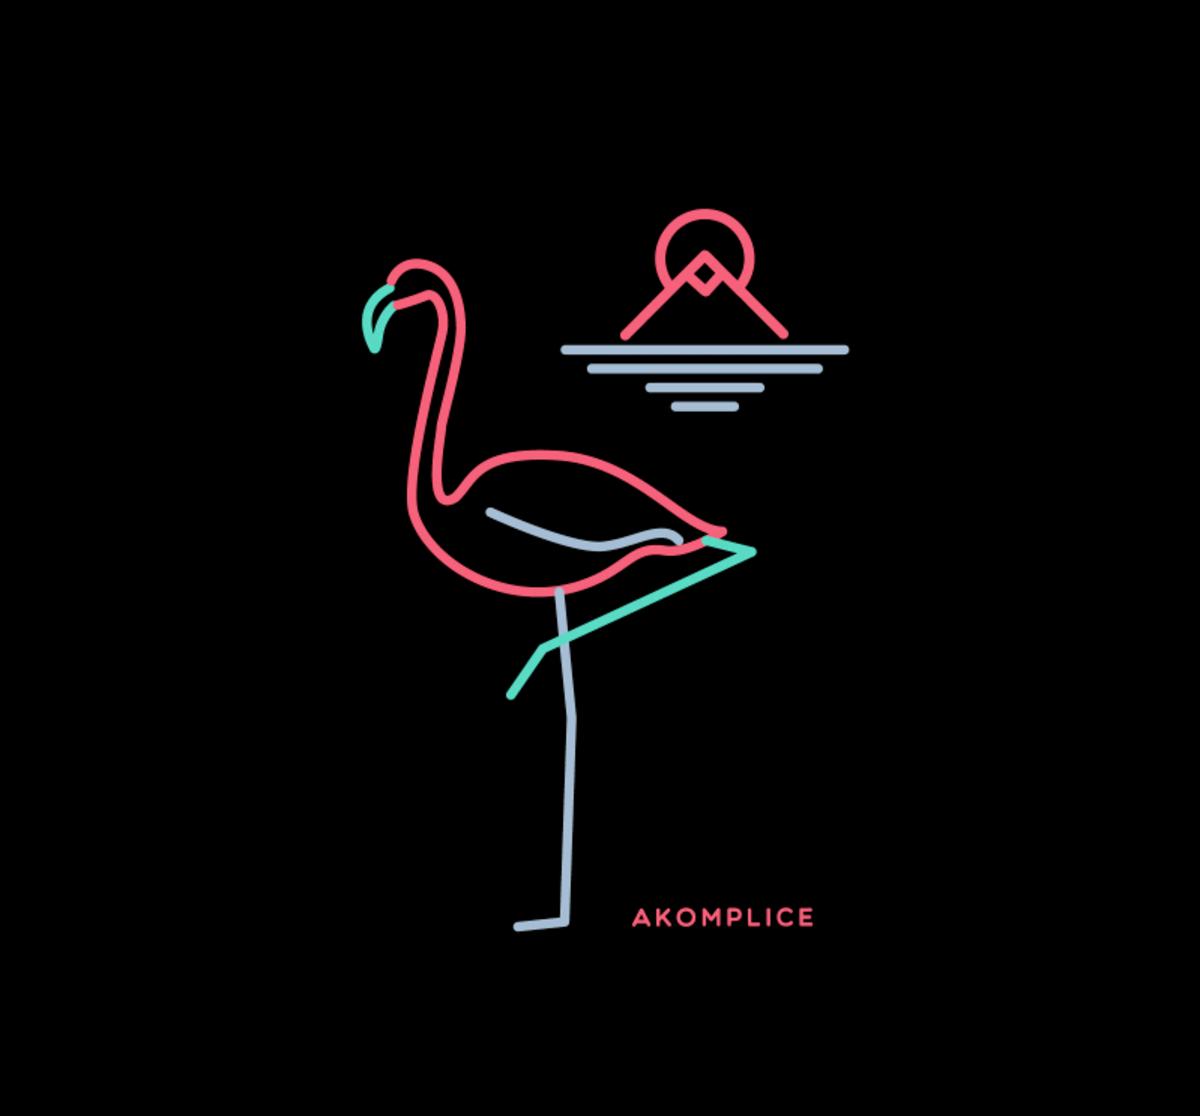 What Clothing Brand Has A Flamingo Logo